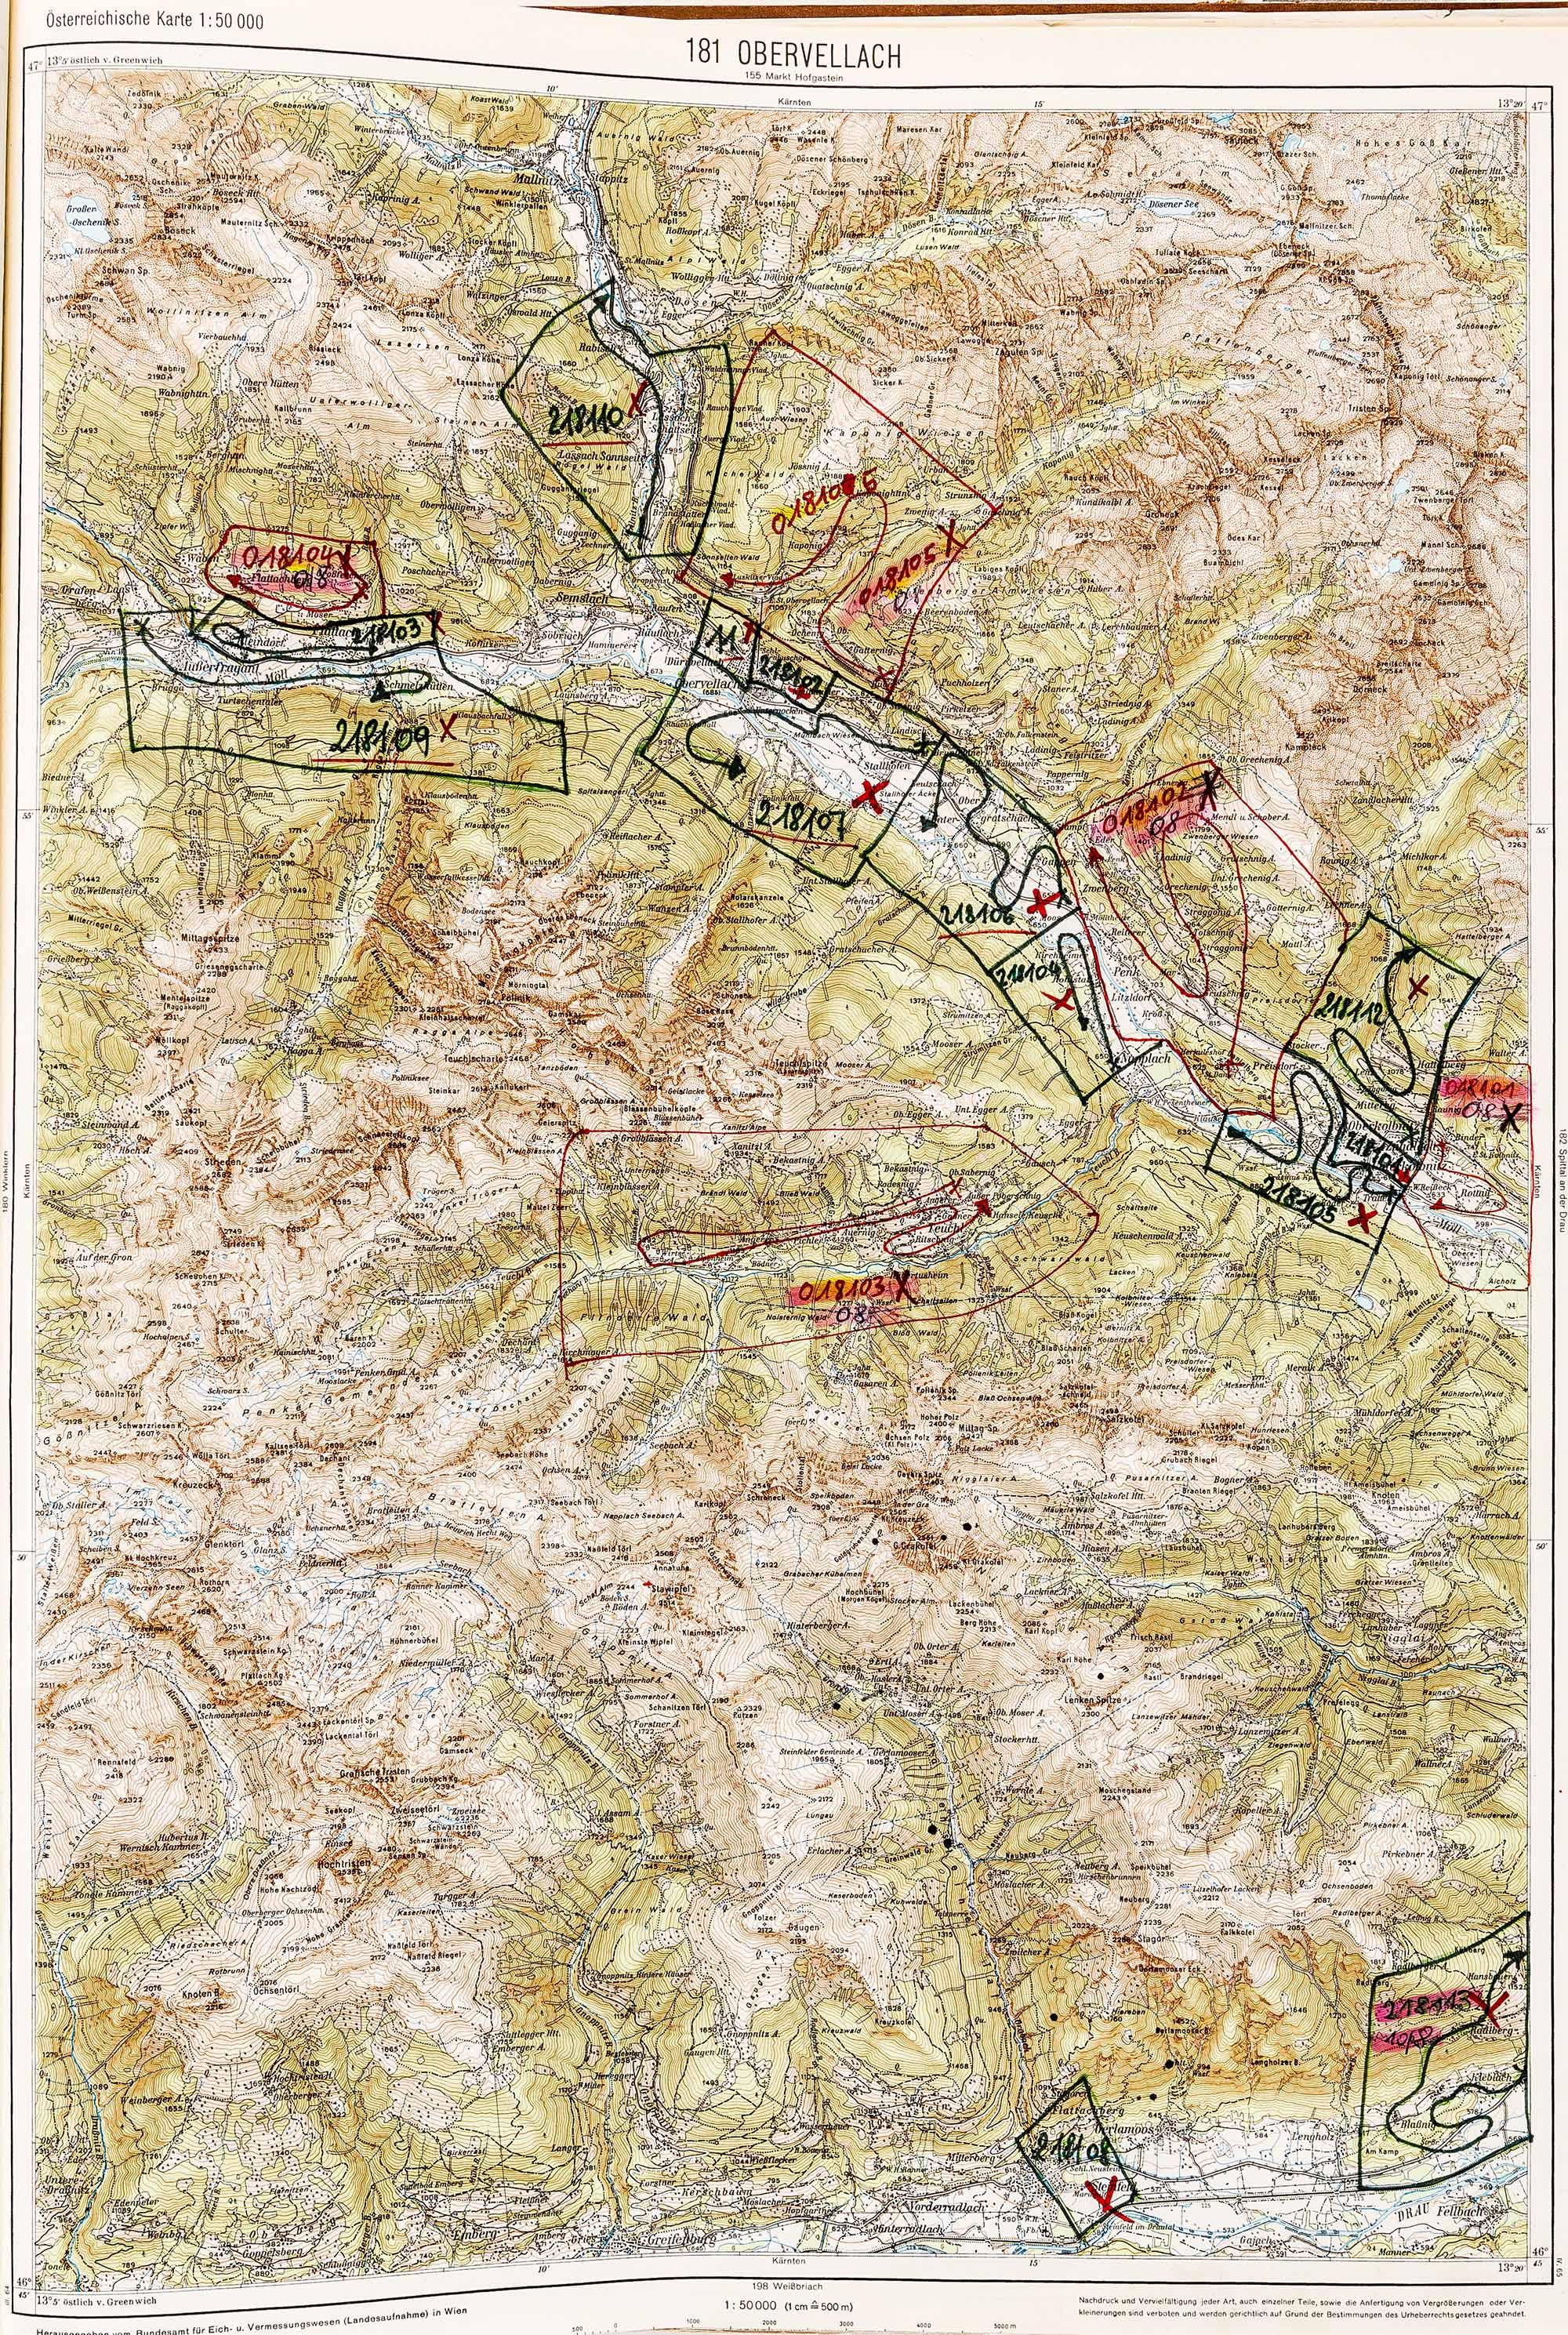 1979-1982 Karte 181